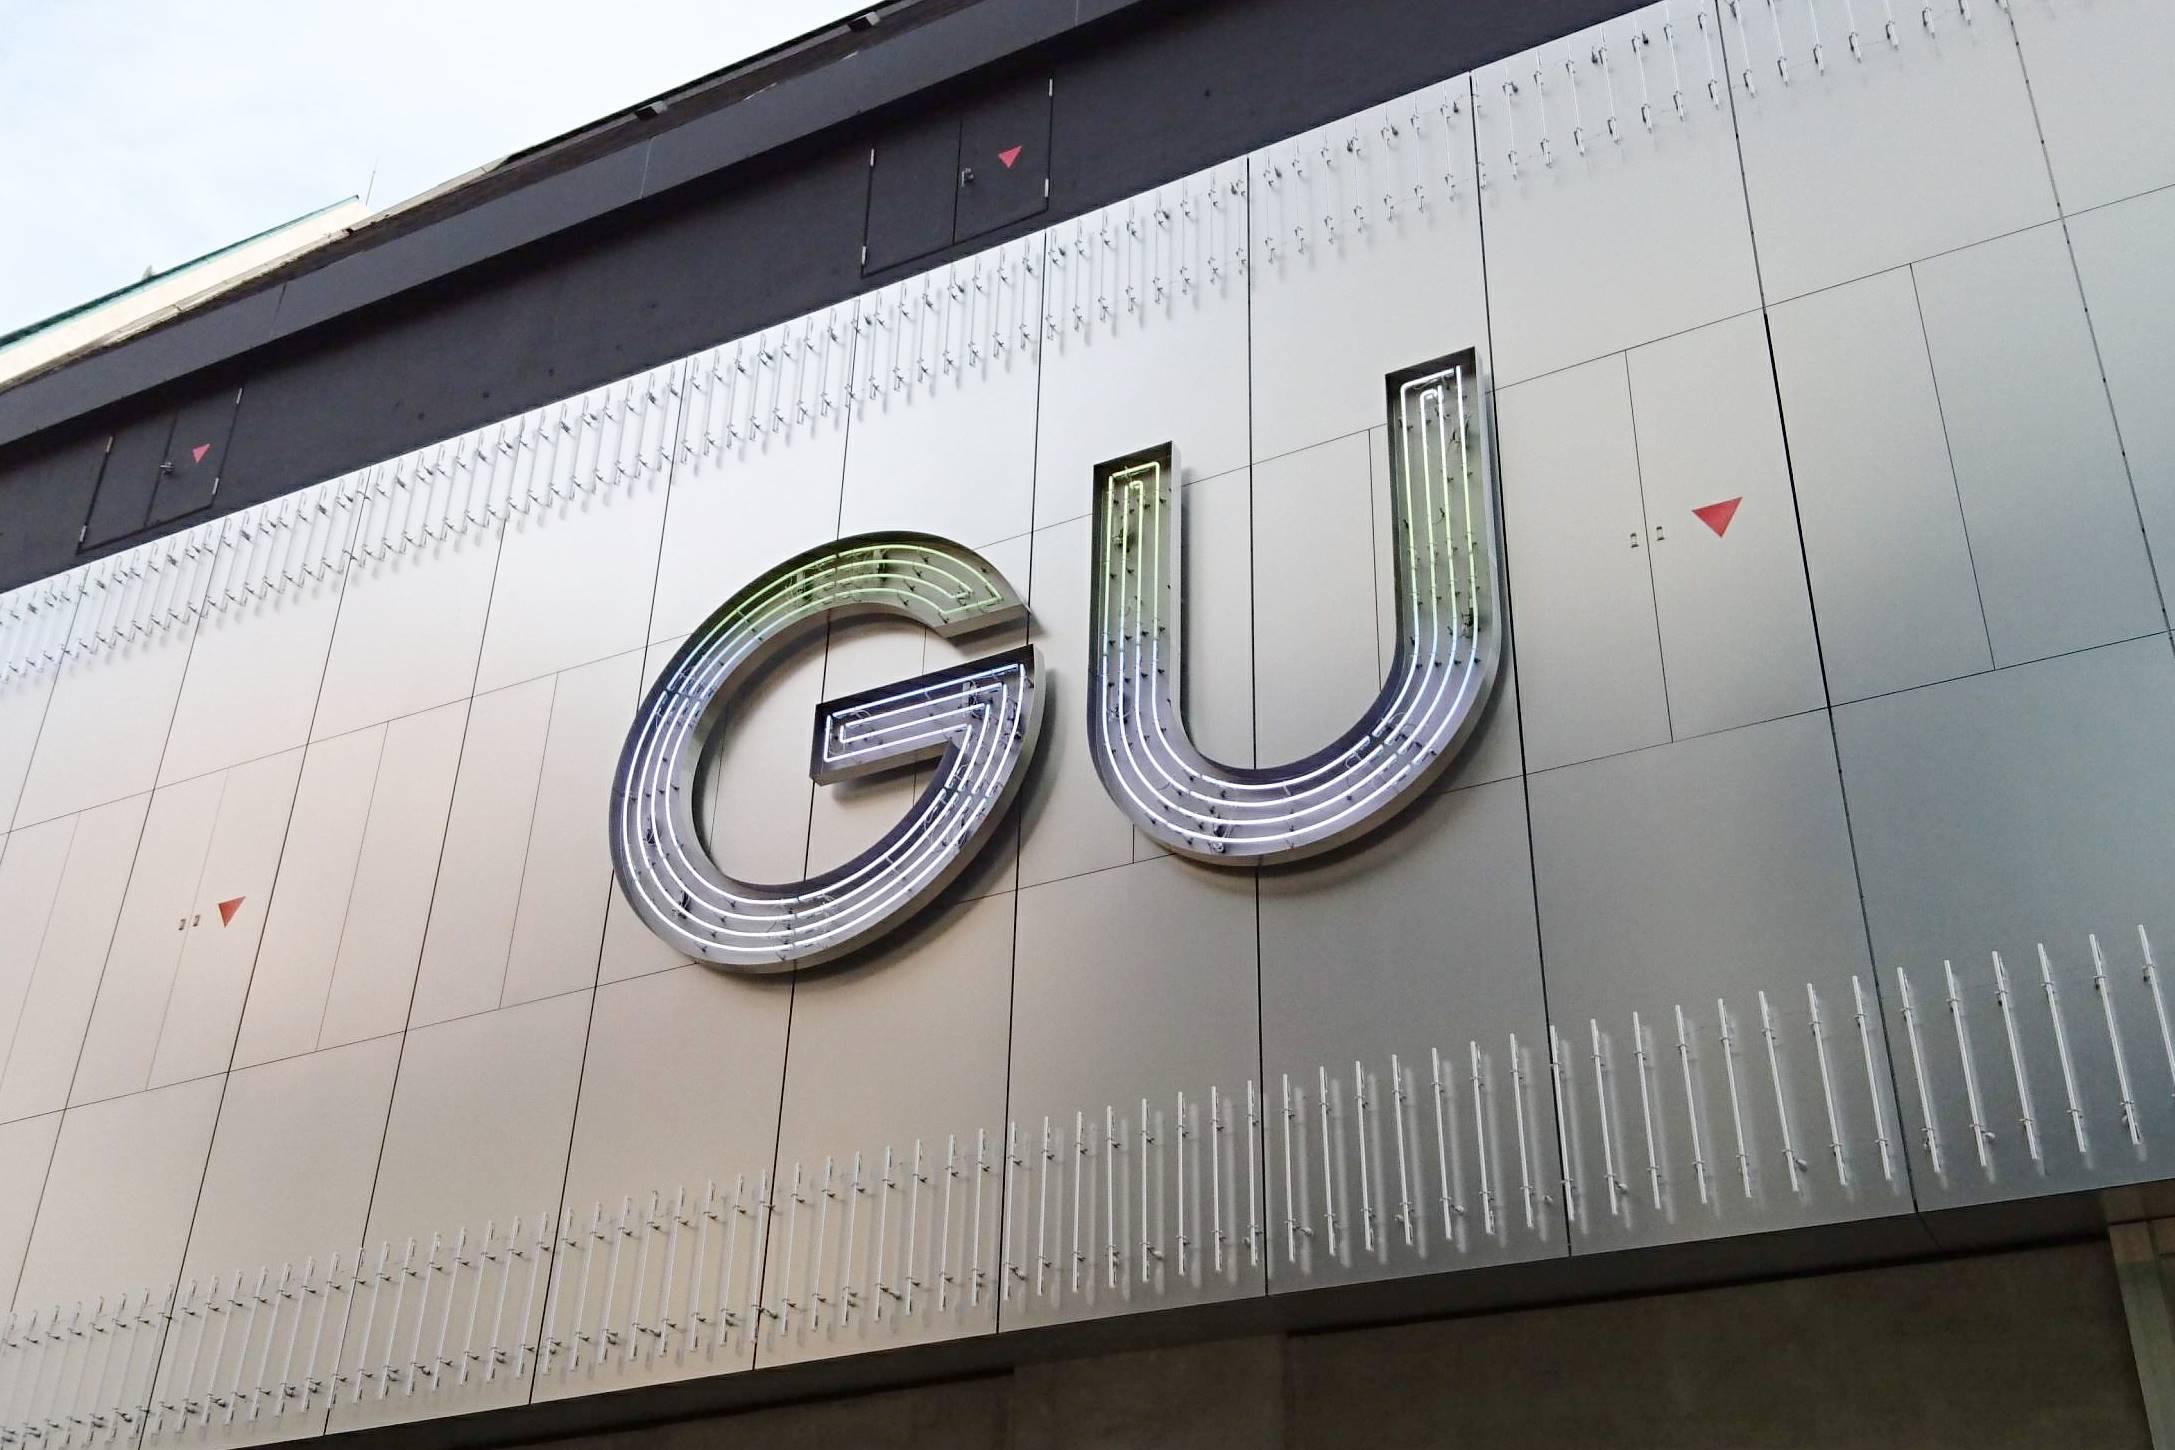 【GU】秋の新作続々…!オシャレ賢者が予想する「完売必須アイテム」とは?